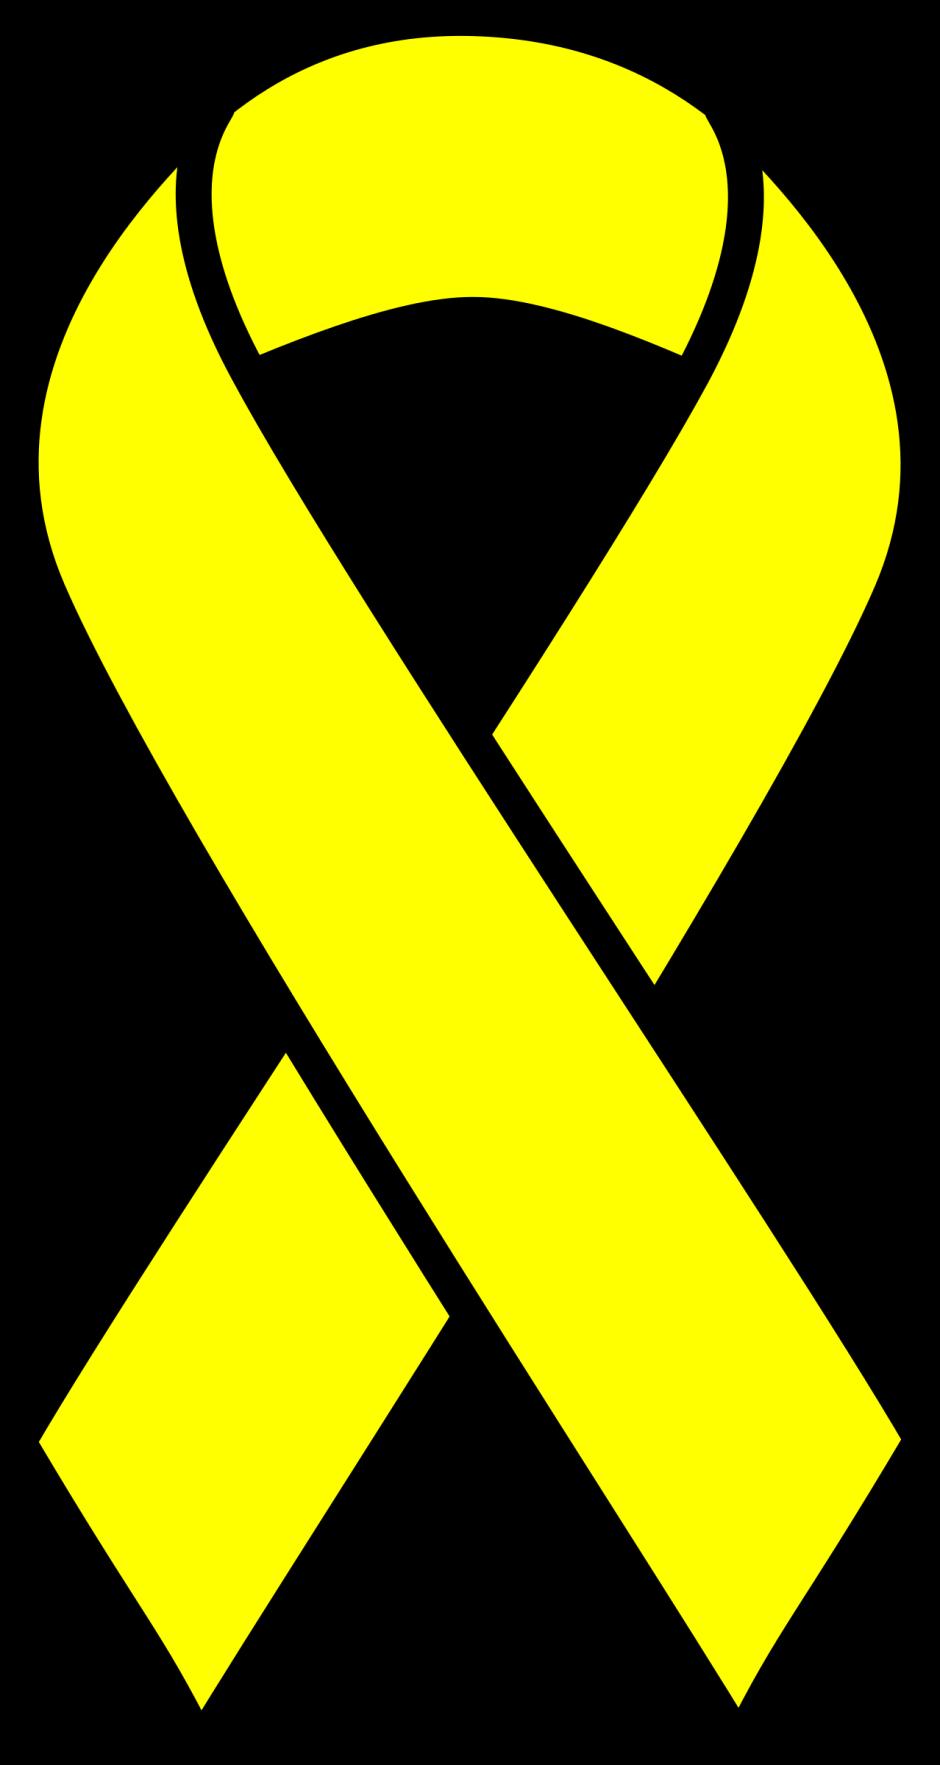 yellow ribbon image